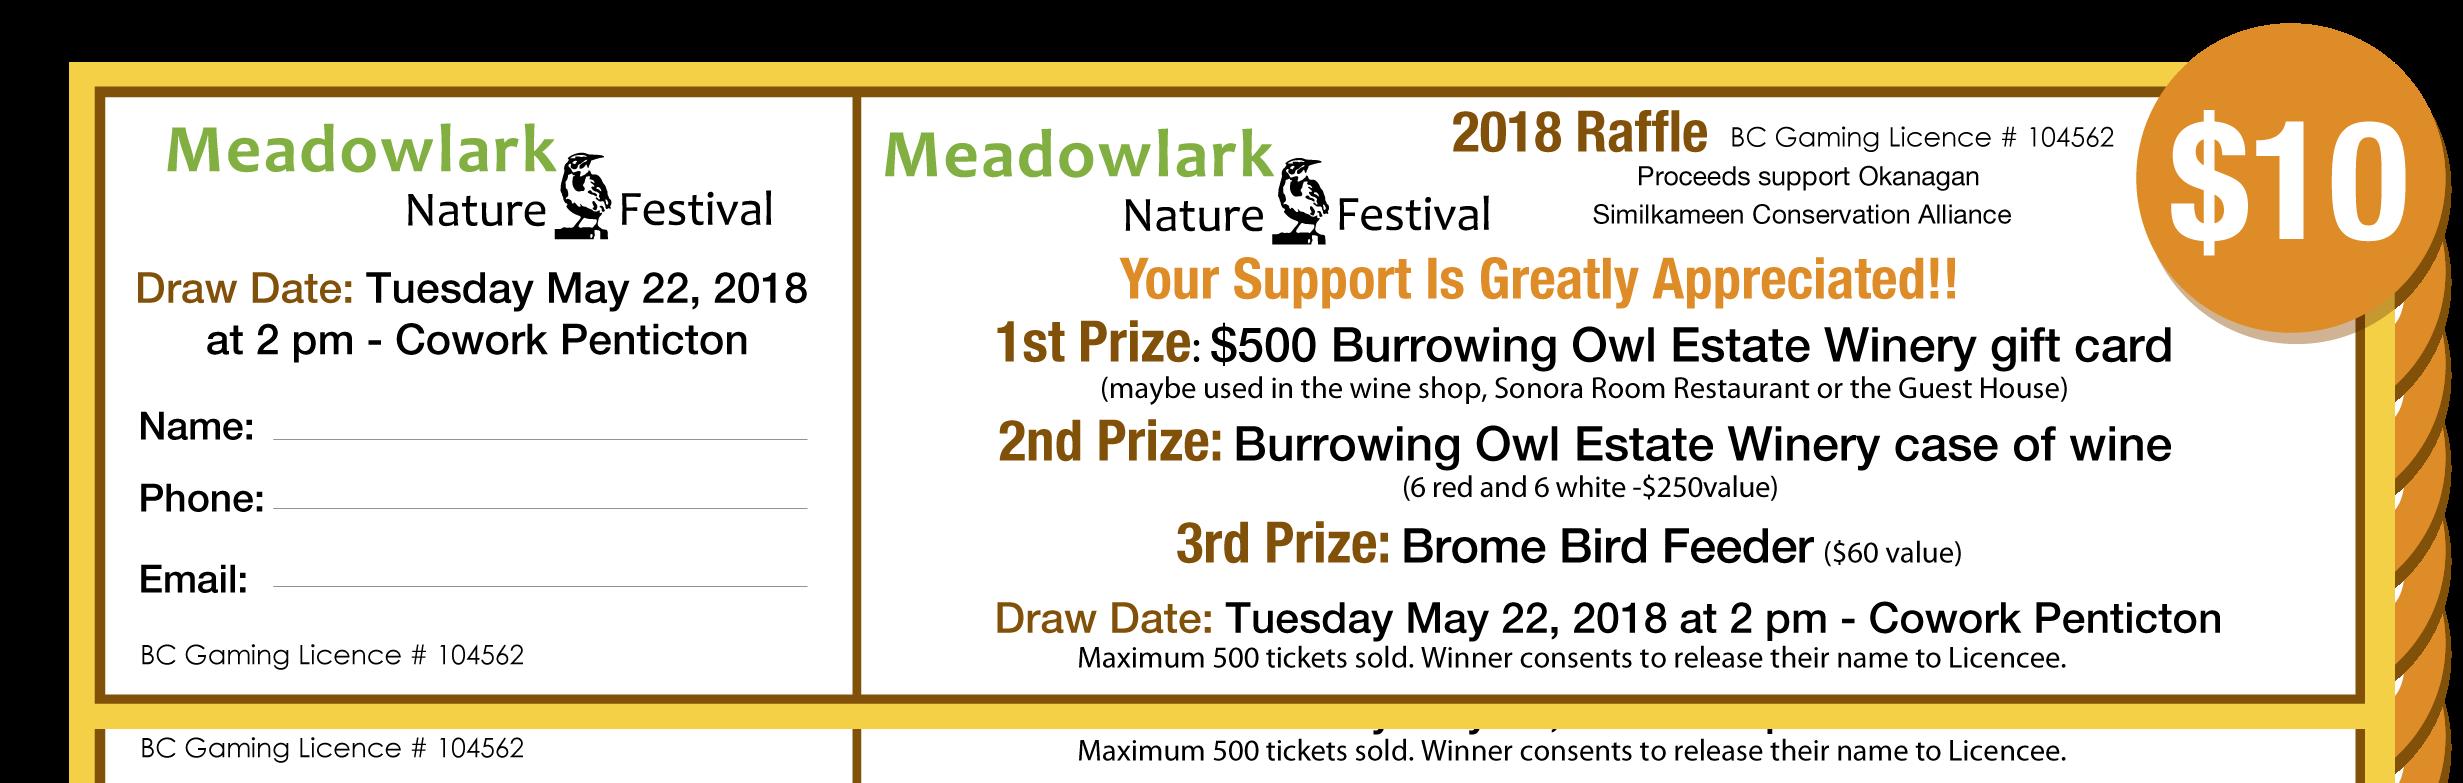 raffle tickets meadowlark nature festivalmeadowlark nature festival